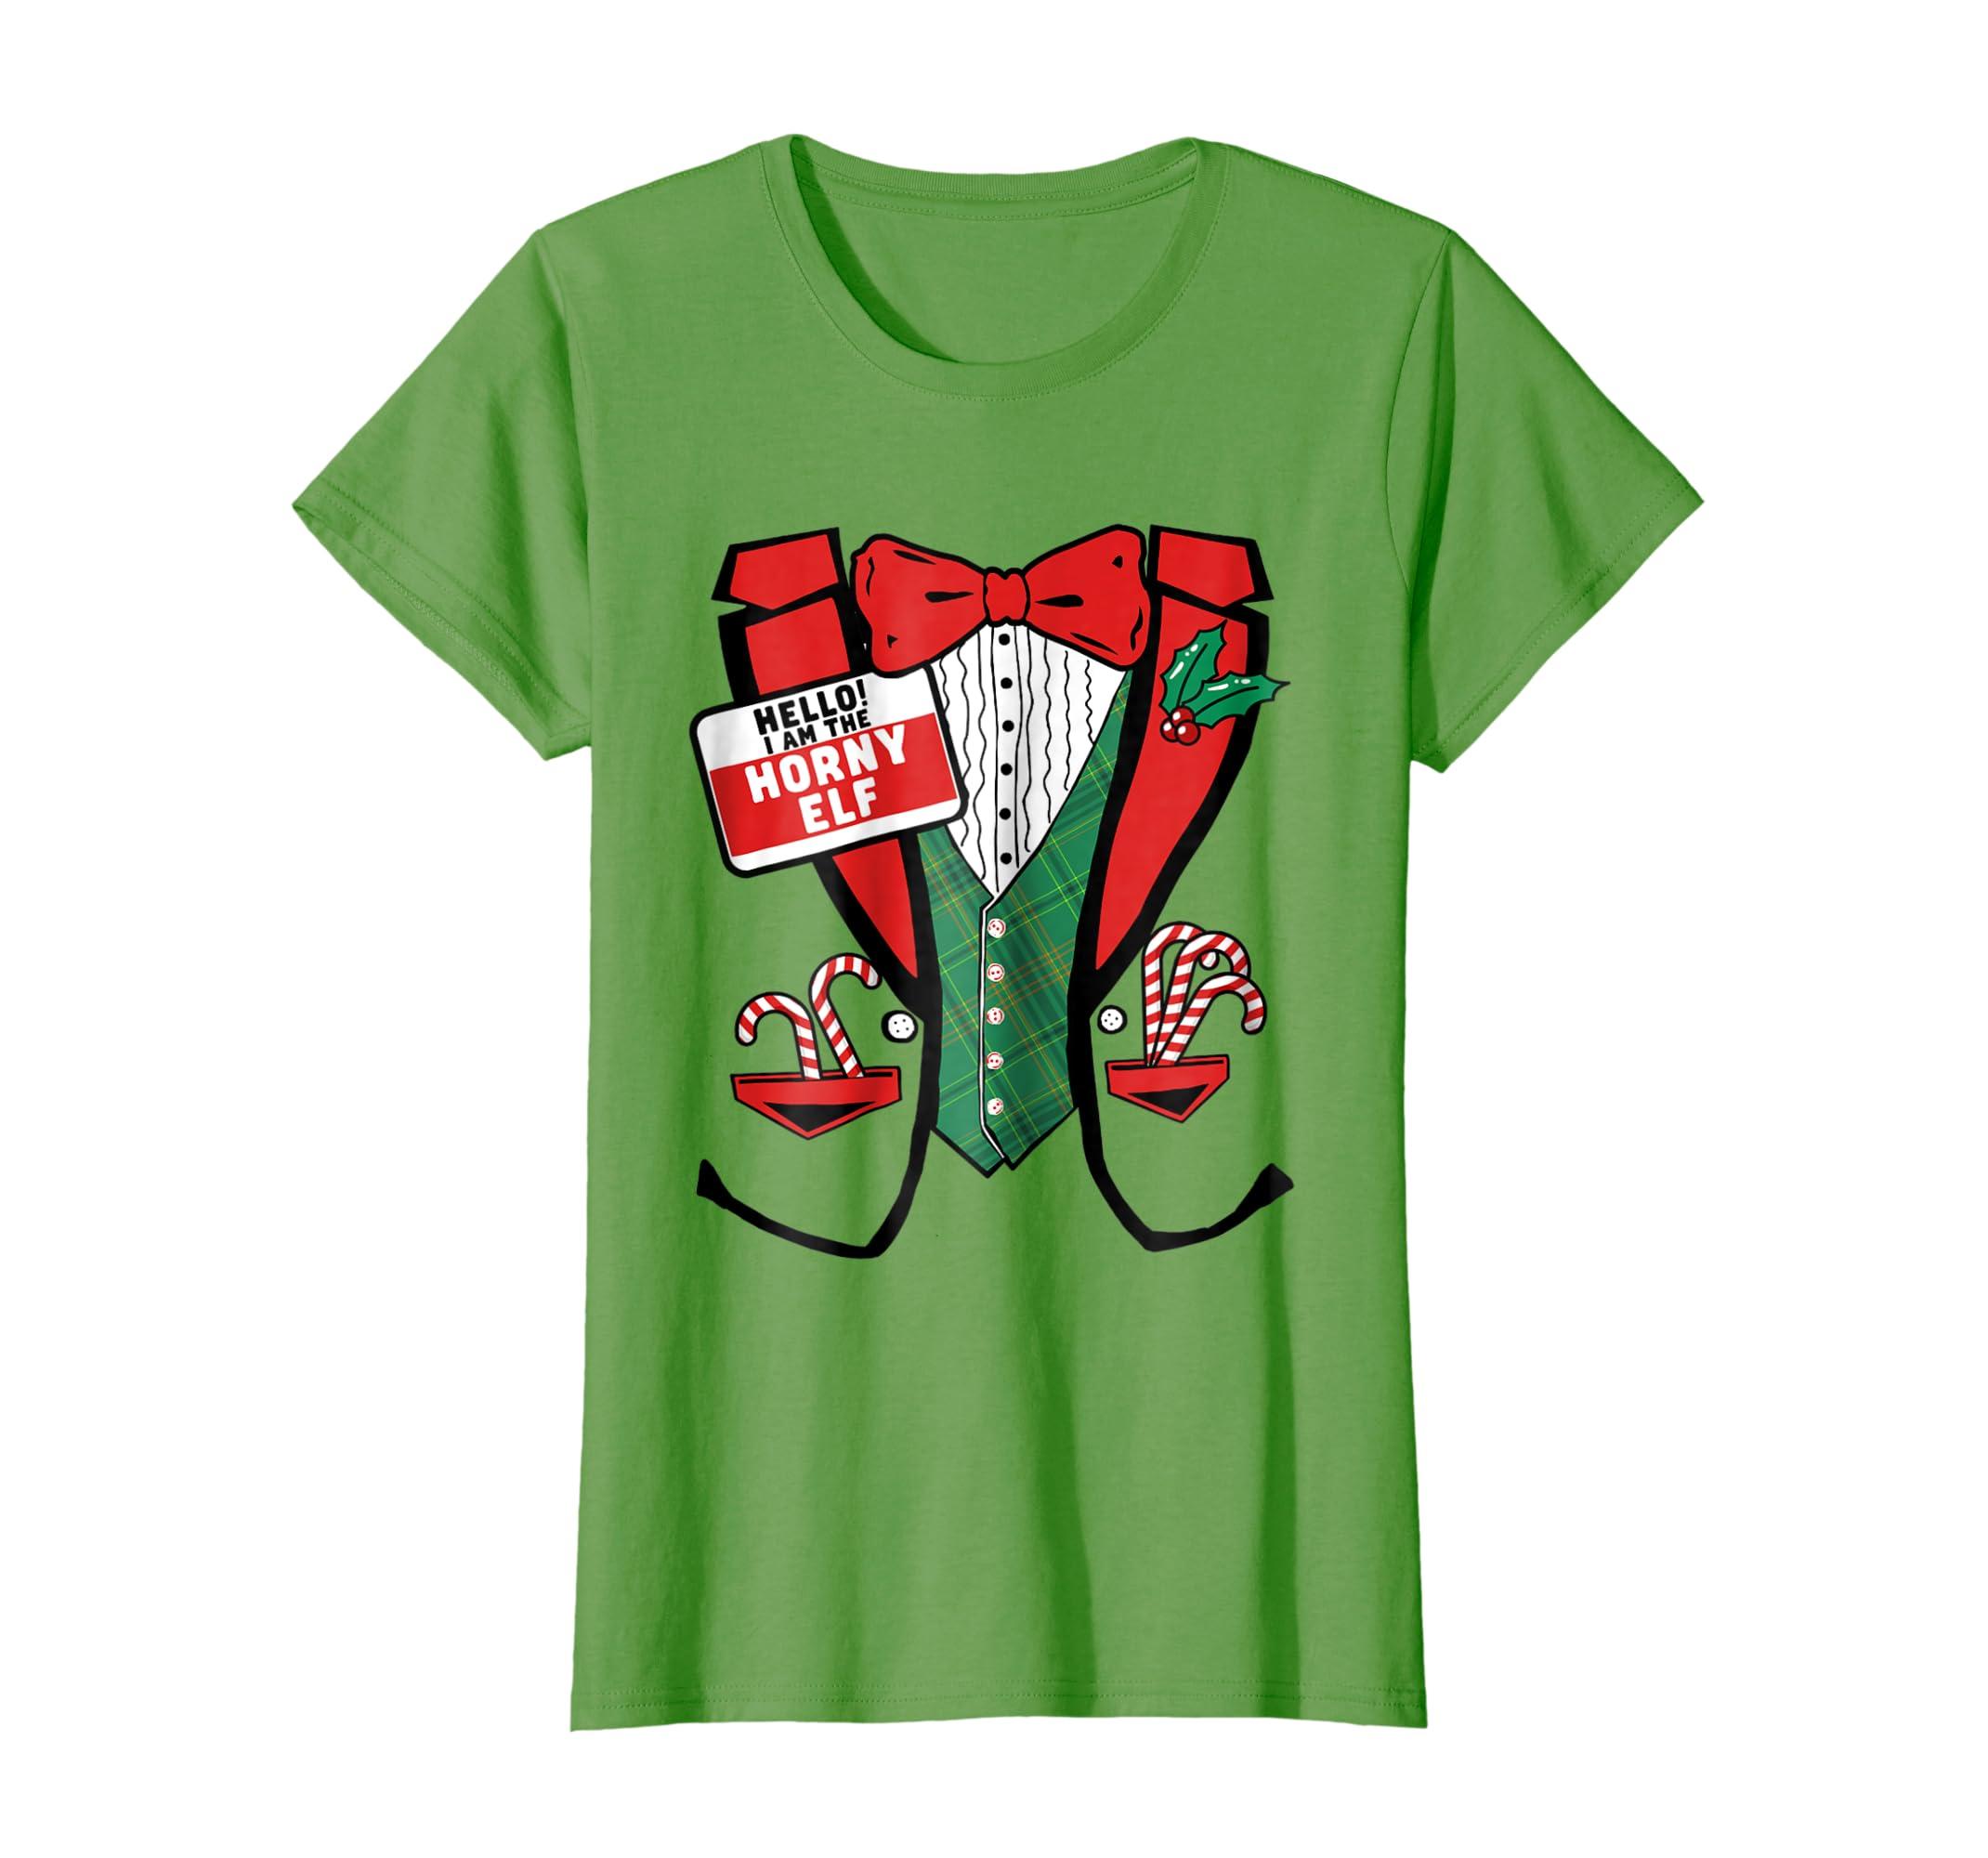 e9d527c2f6 Amazon.com: I'm the Horny Elf! Funny Group Christmas Tux T-Shirt: Clothing